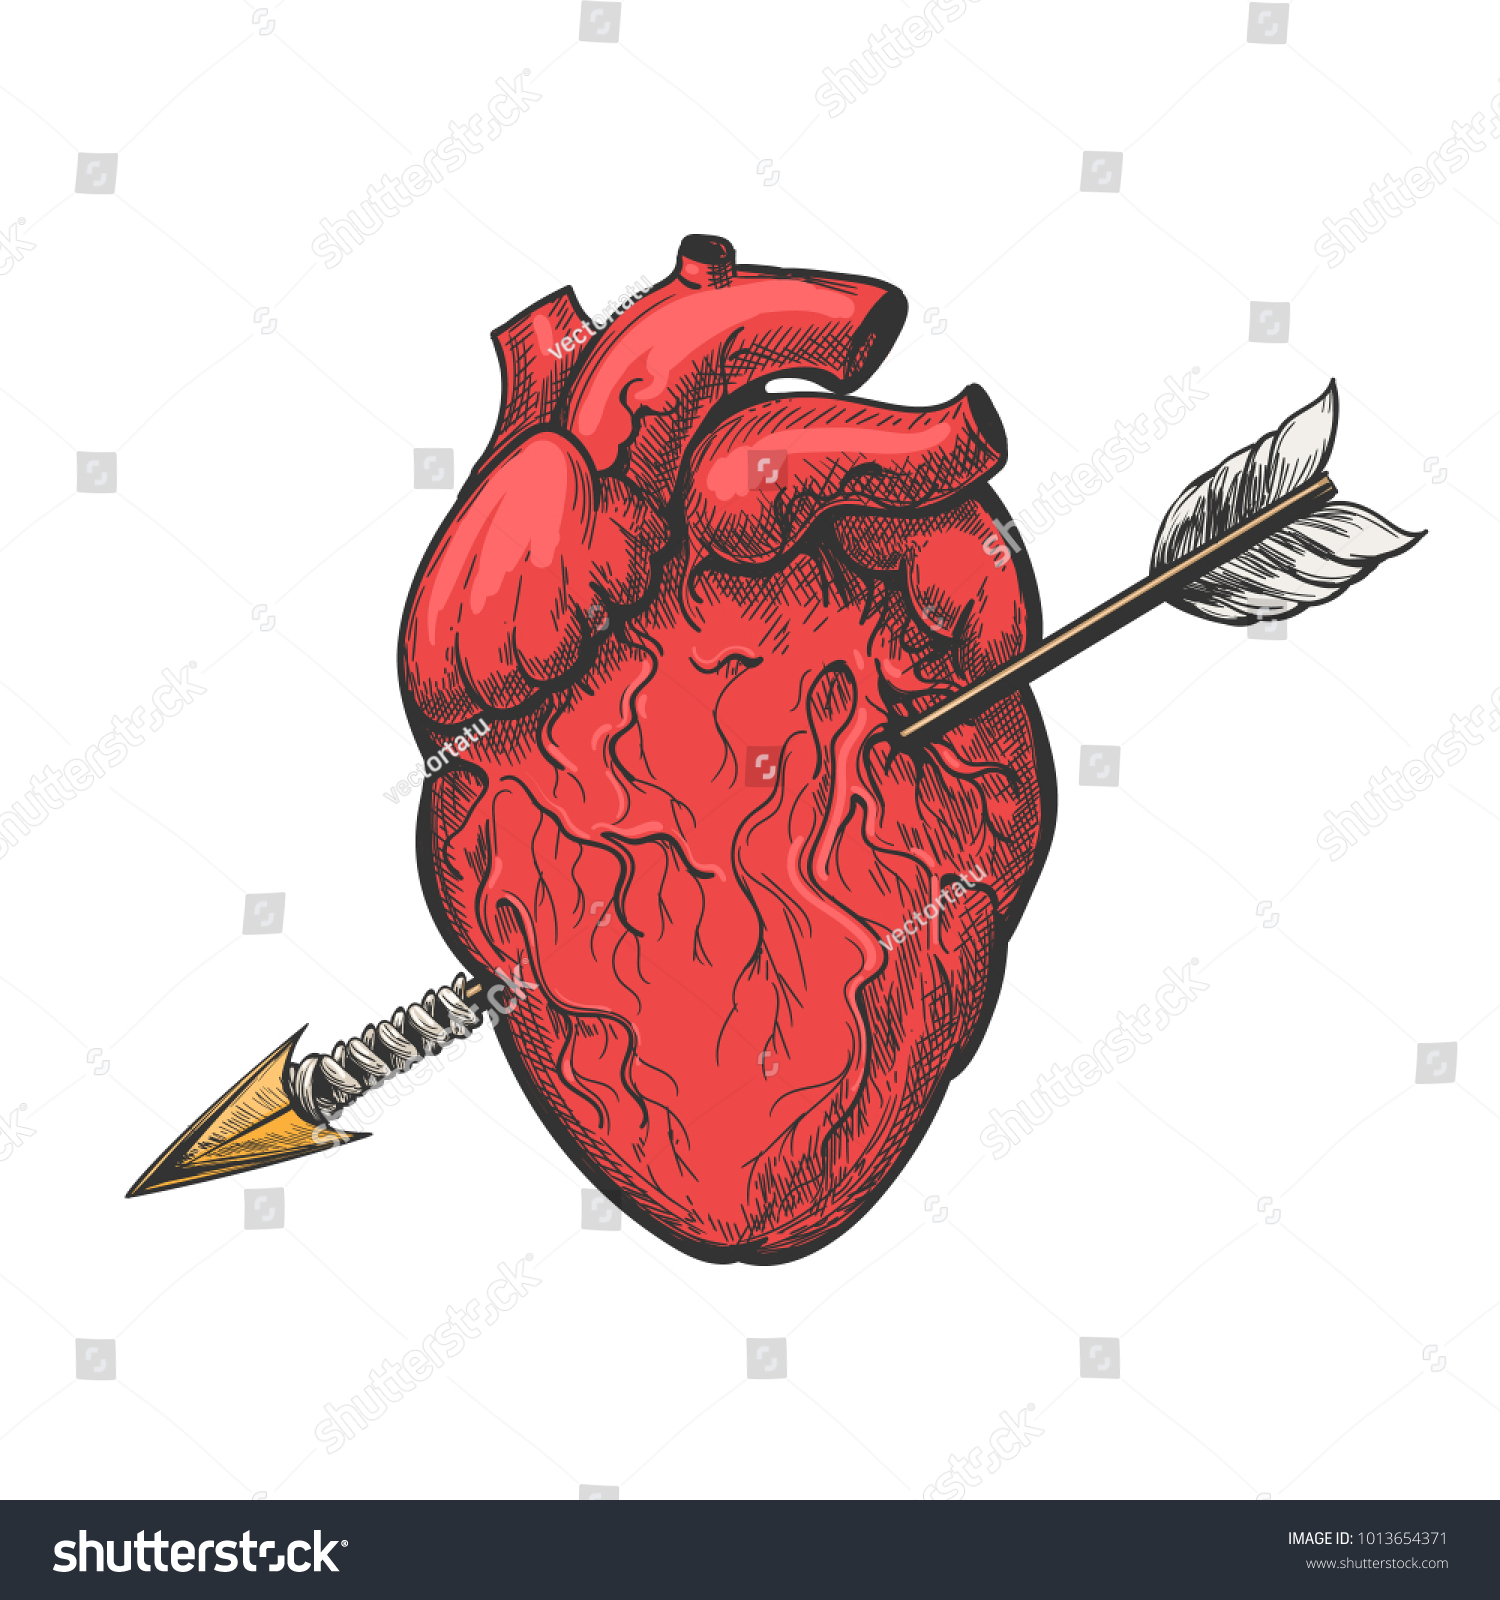 Human Heart Arrow Drawing Real Vector Stock Vector 1013654371 ...